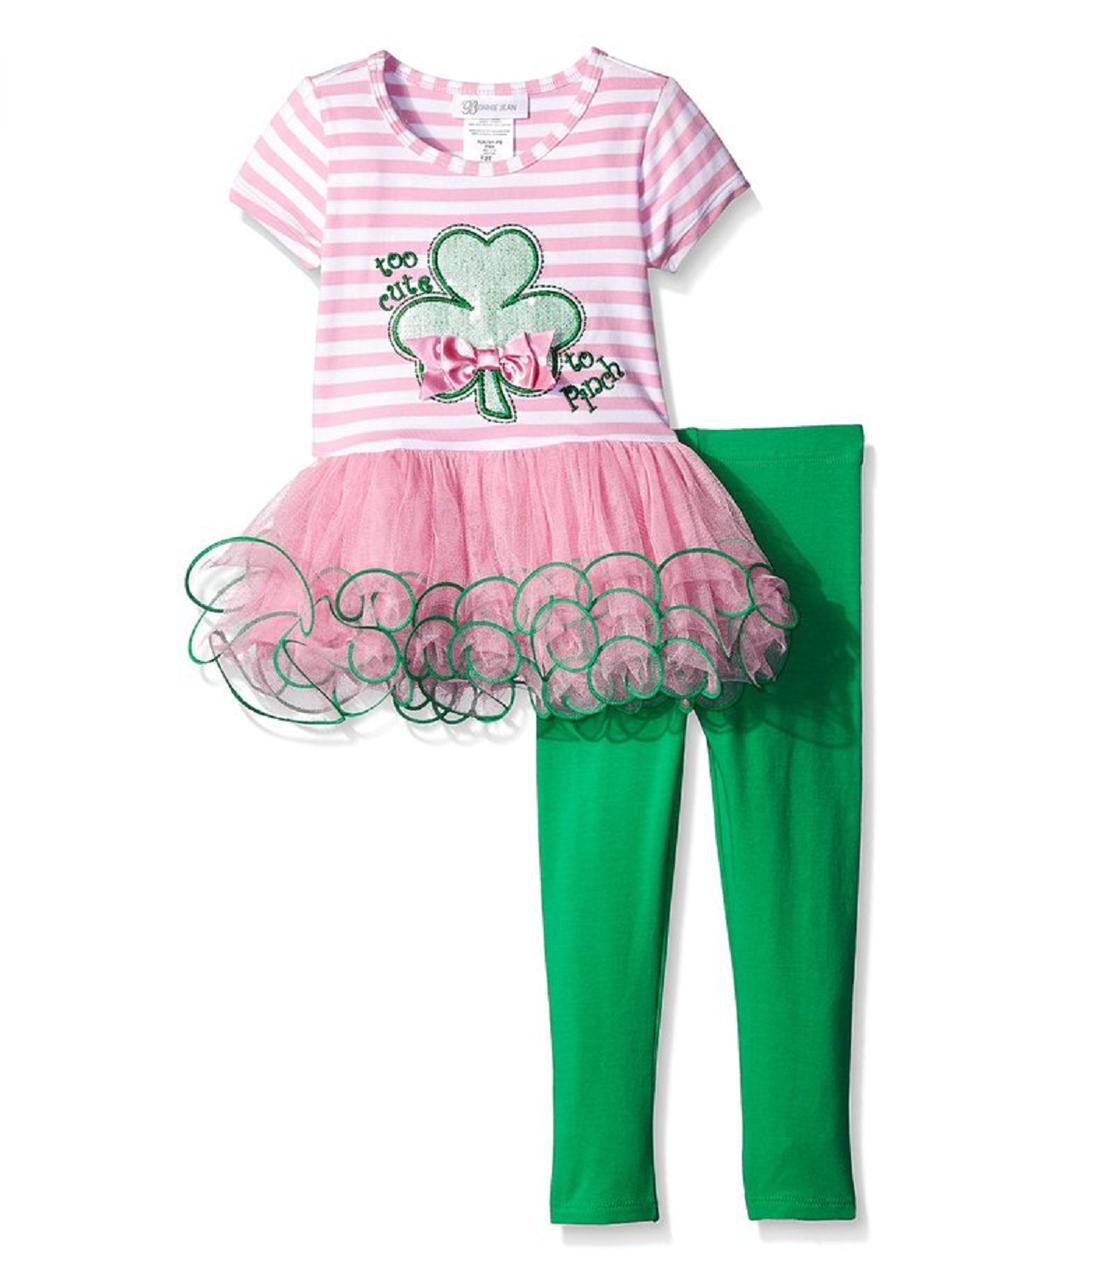 245cdc2b221 Bonnie Jean Baby Girls Green Clover St Patrick's Bow Pink Legging ...